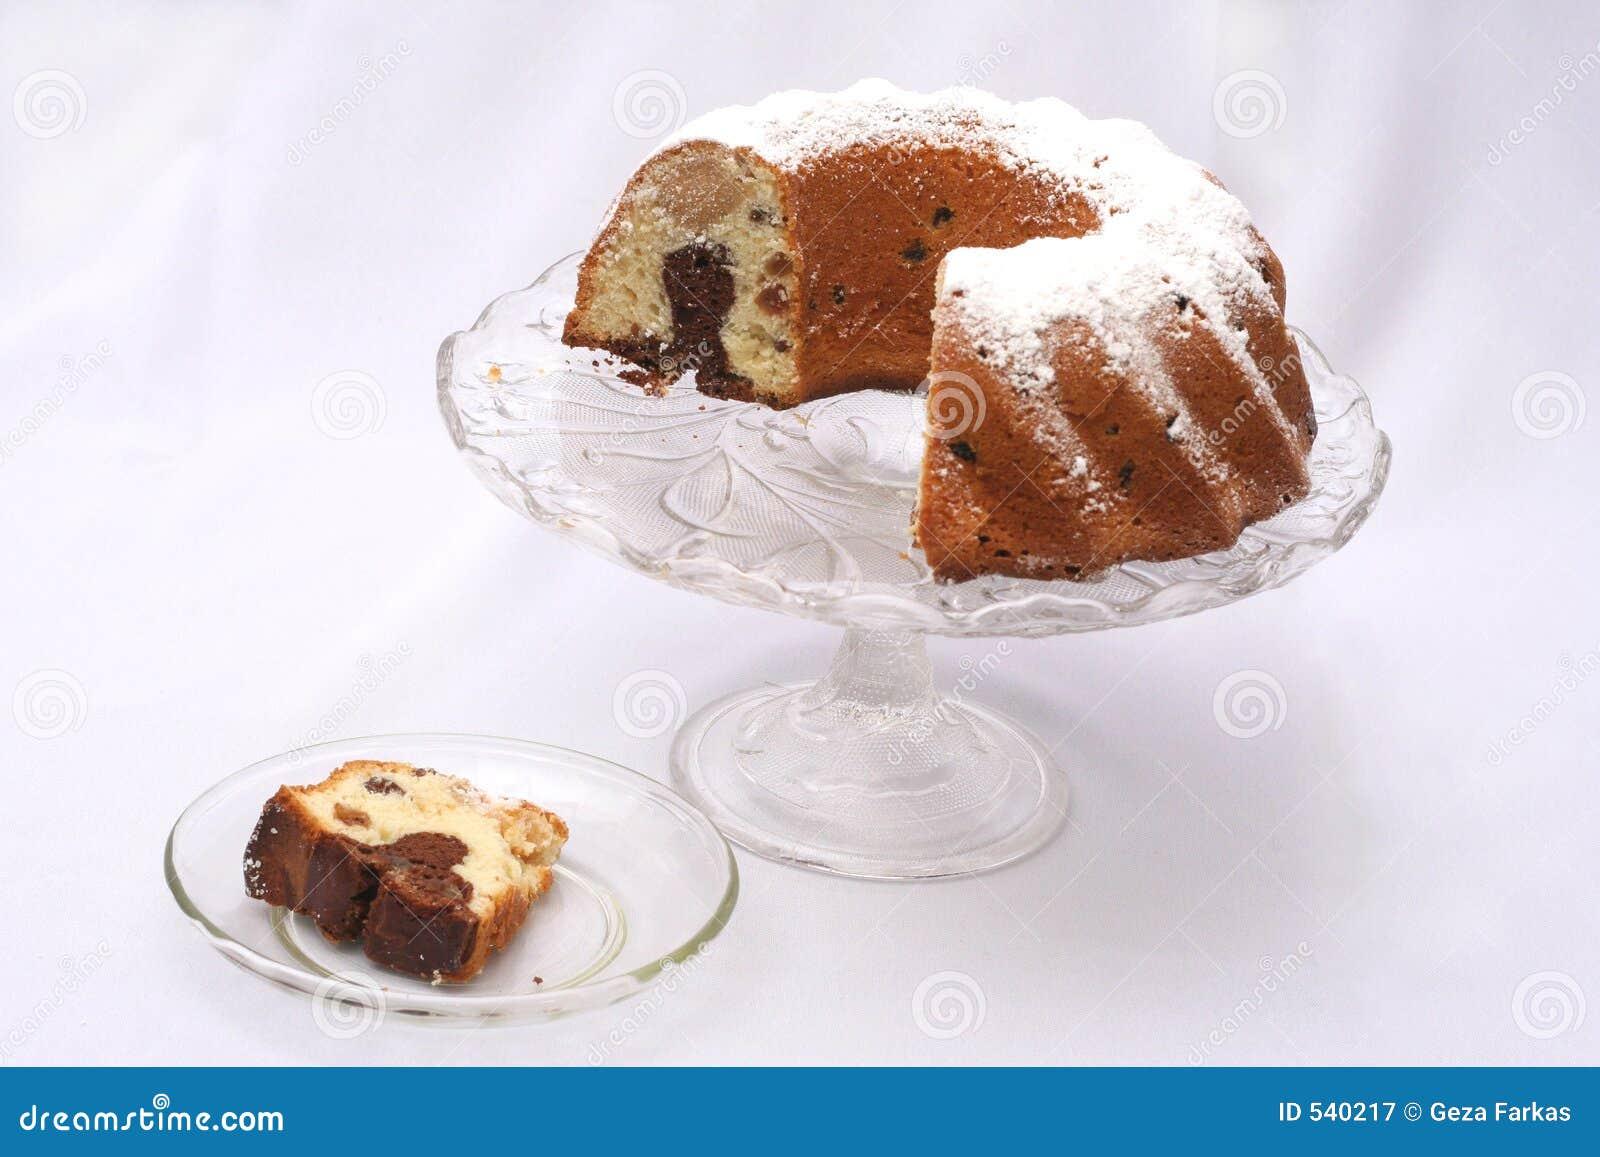 Download 来回的蛋糕 库存图片. 图片 包括有 蛋糕, 小圆面包, 烹调, 查出, 酥皮点心, 点心, 曲奇饼, 好吃的东西 - 540217